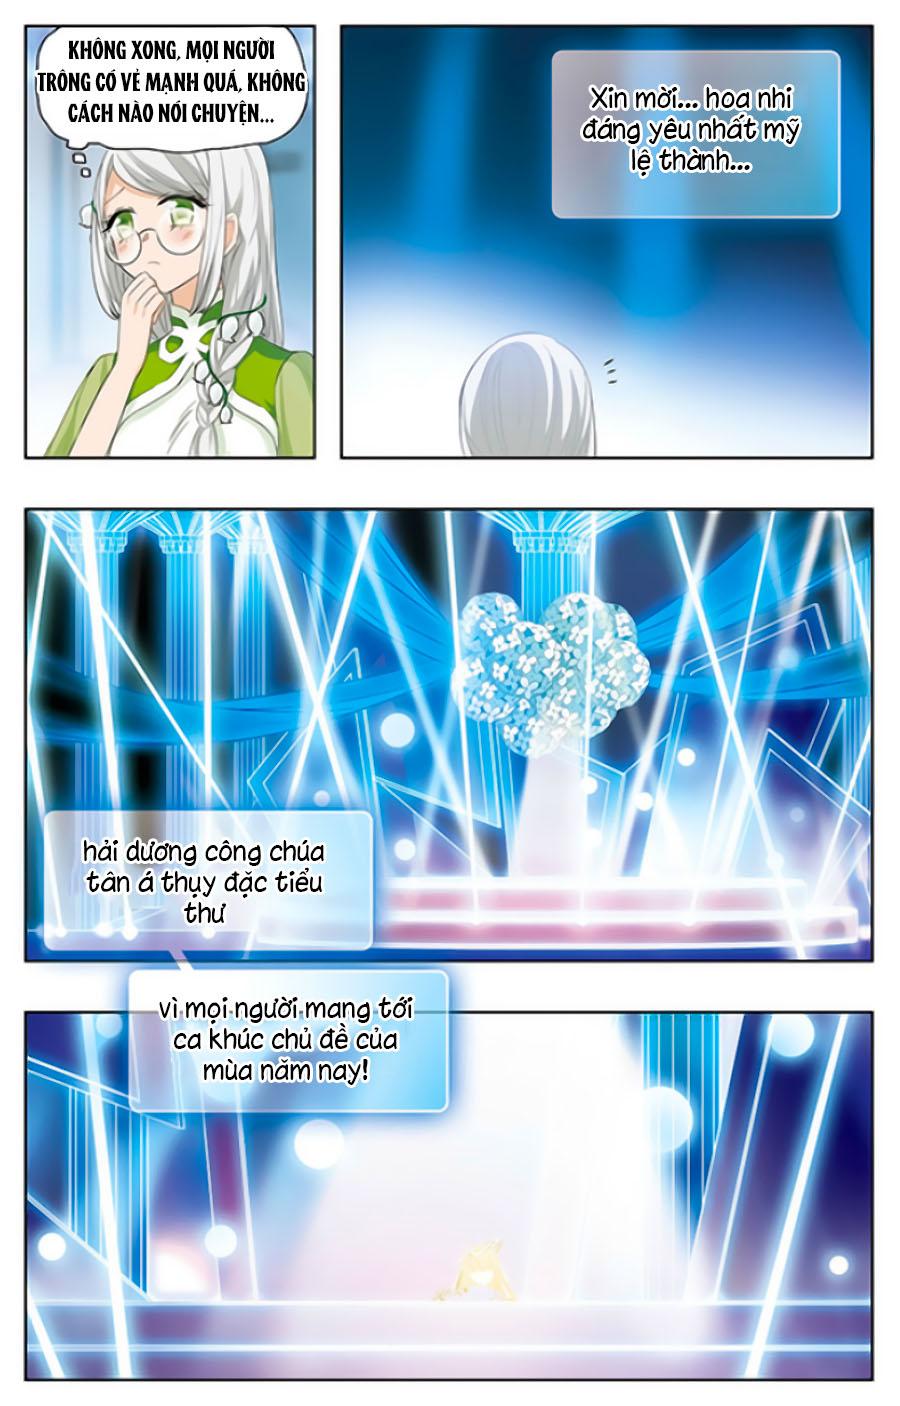 Tinh Linh Tố Chap 14 - Trang 13